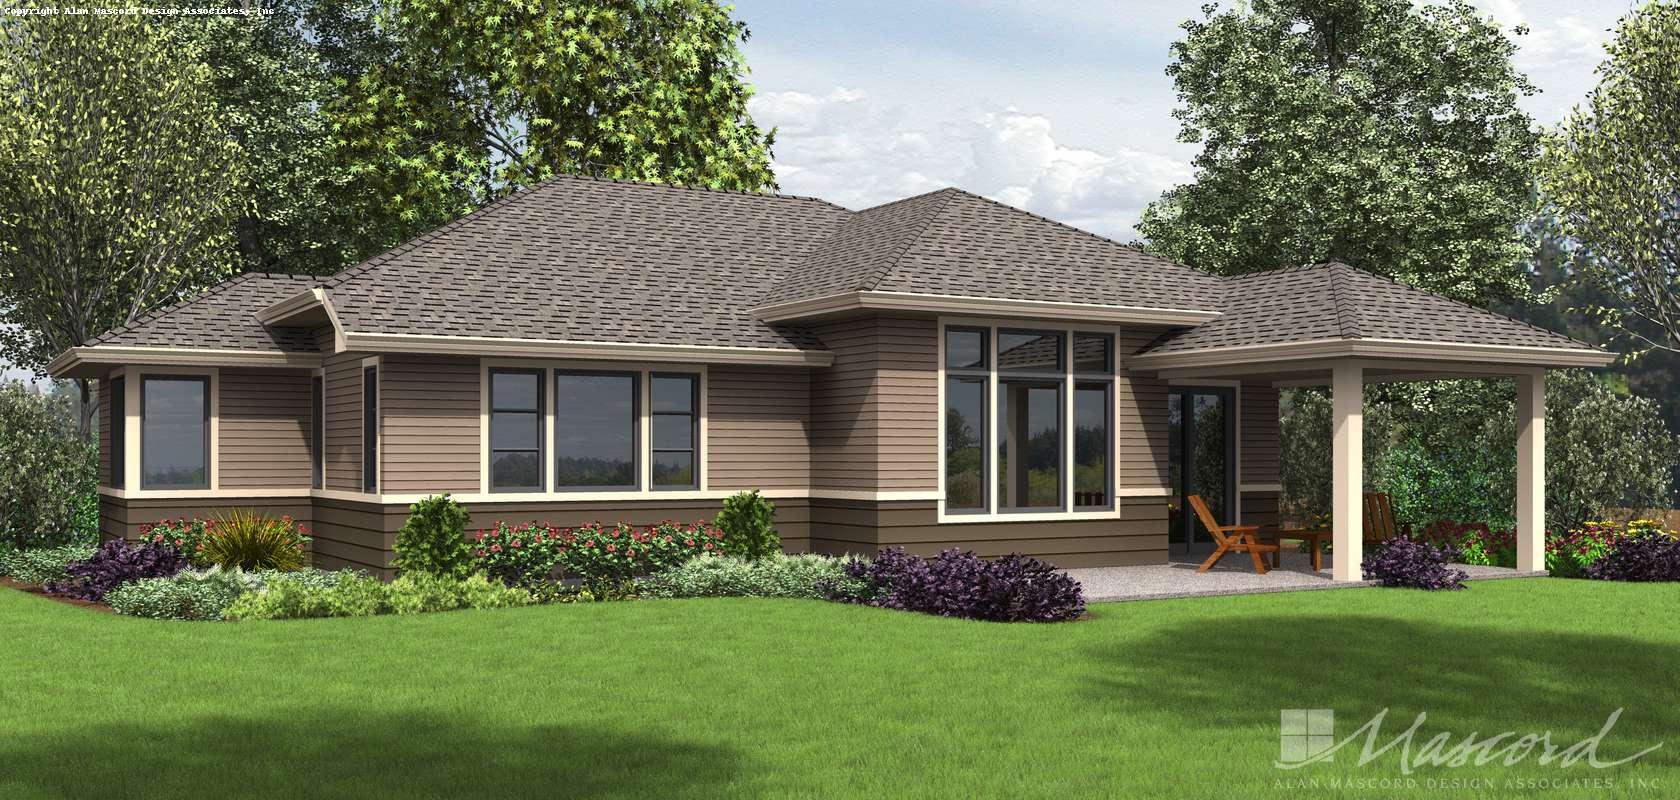 Mascord House Plan 1169B: The Whittier